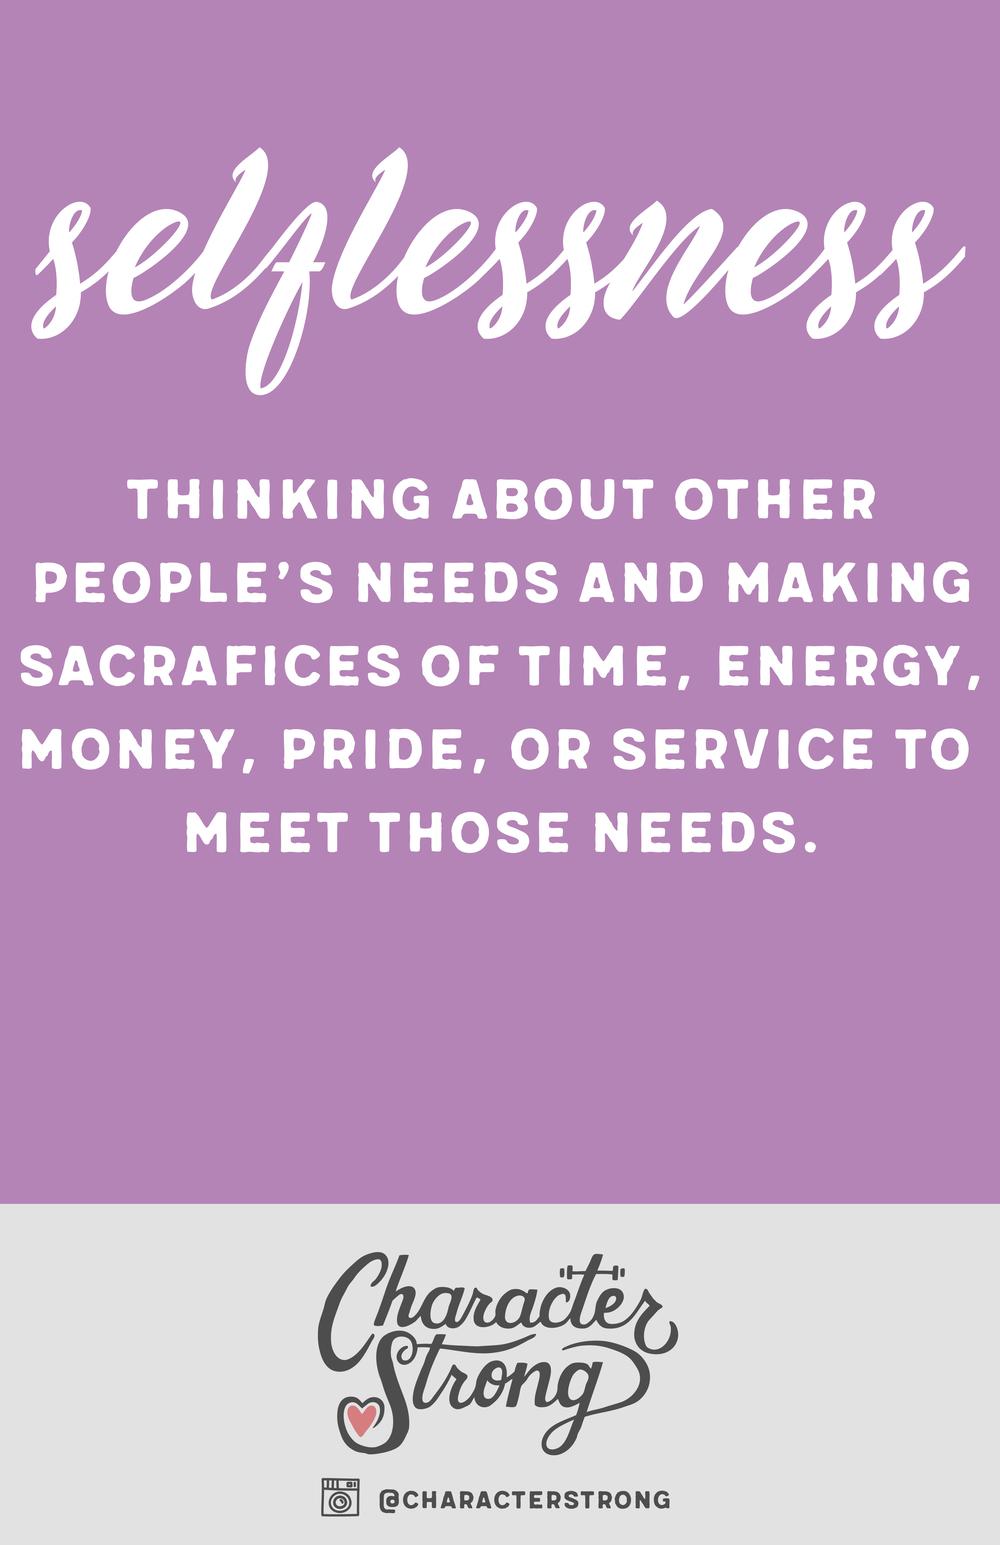 Selflessness-5.jpg